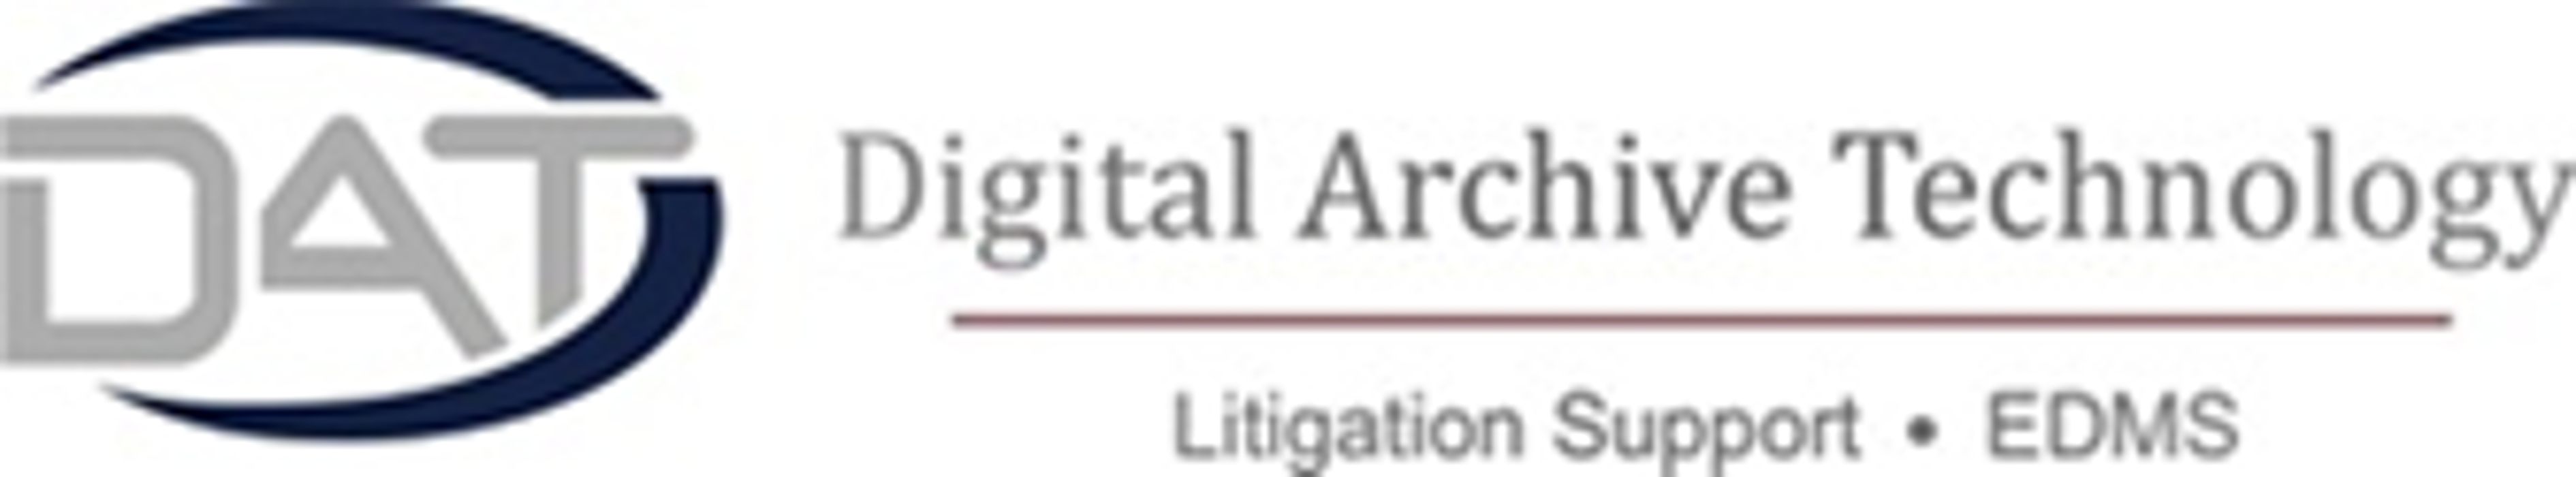 Digital Archive Technology